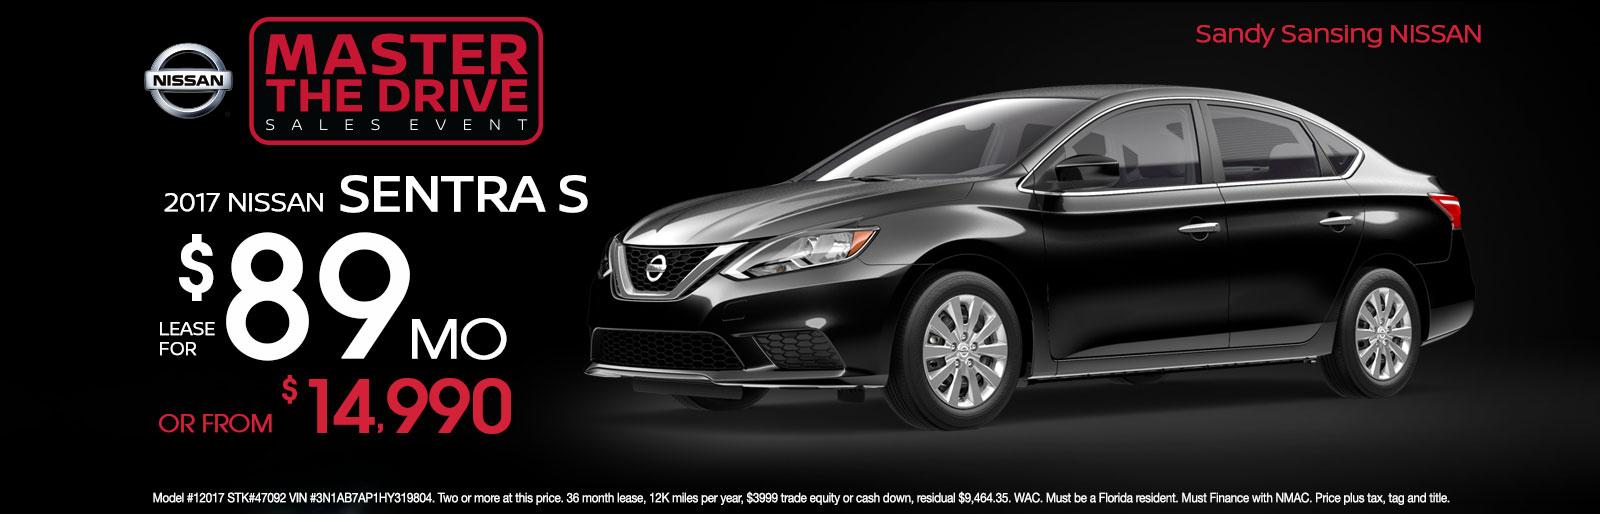 Sandy Sansing Used Cars >> Sandy Sansing Nissan | Upcomingcarshq.com